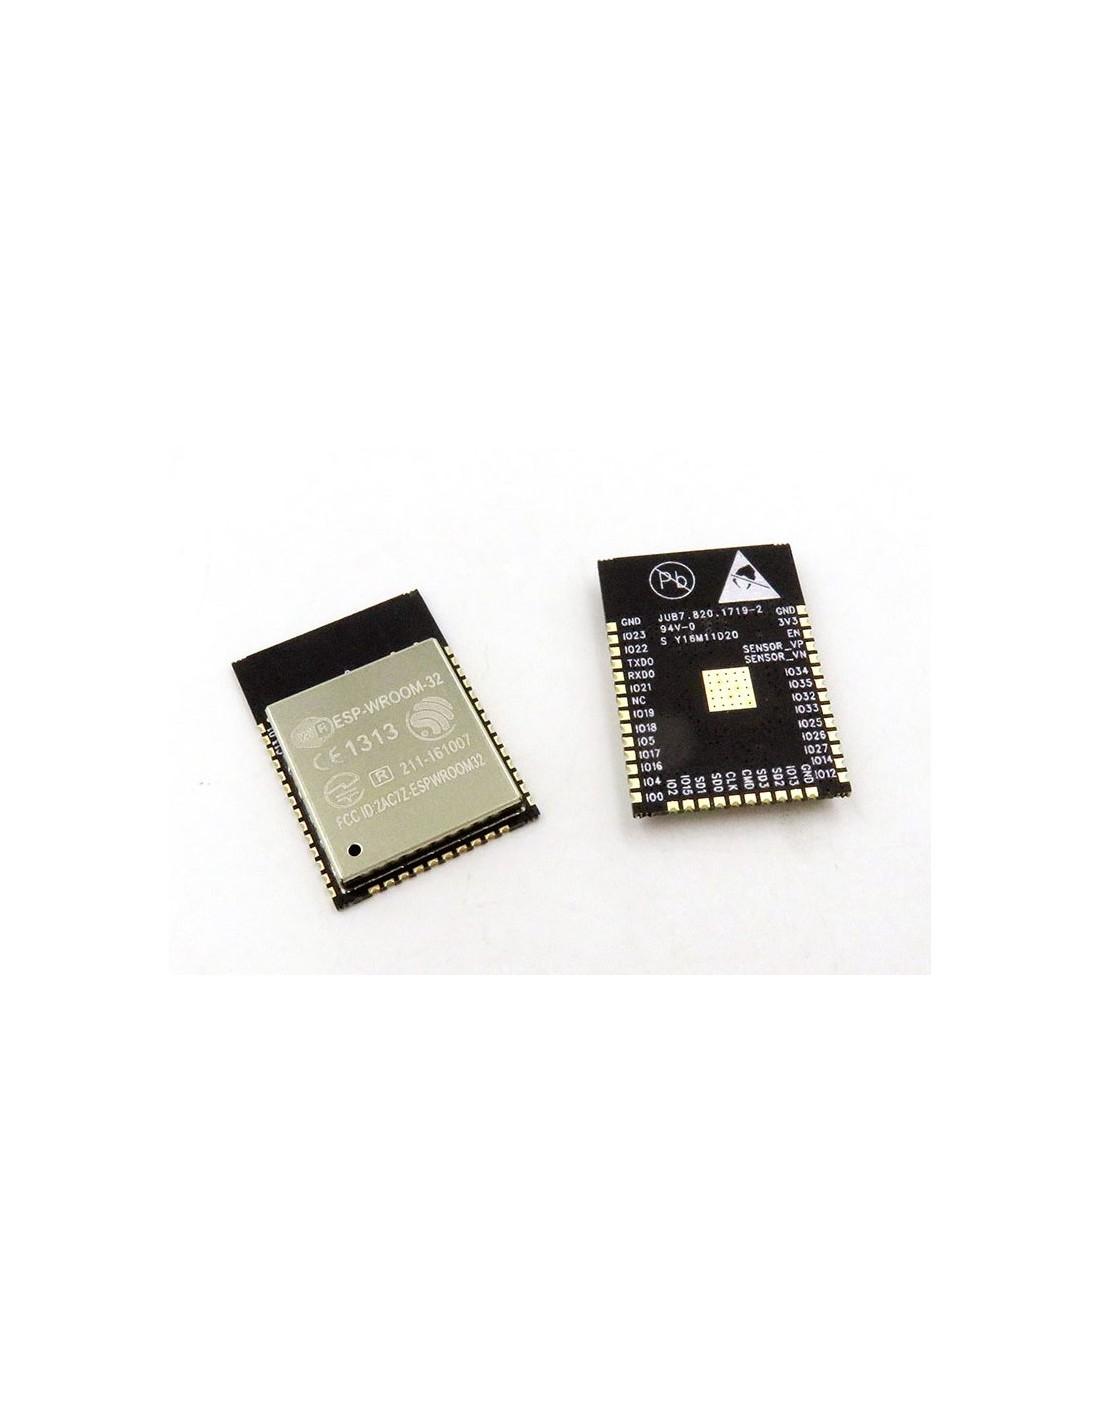 ESP-WROOM-32, ESP32 WIFI+BT+BLE Module